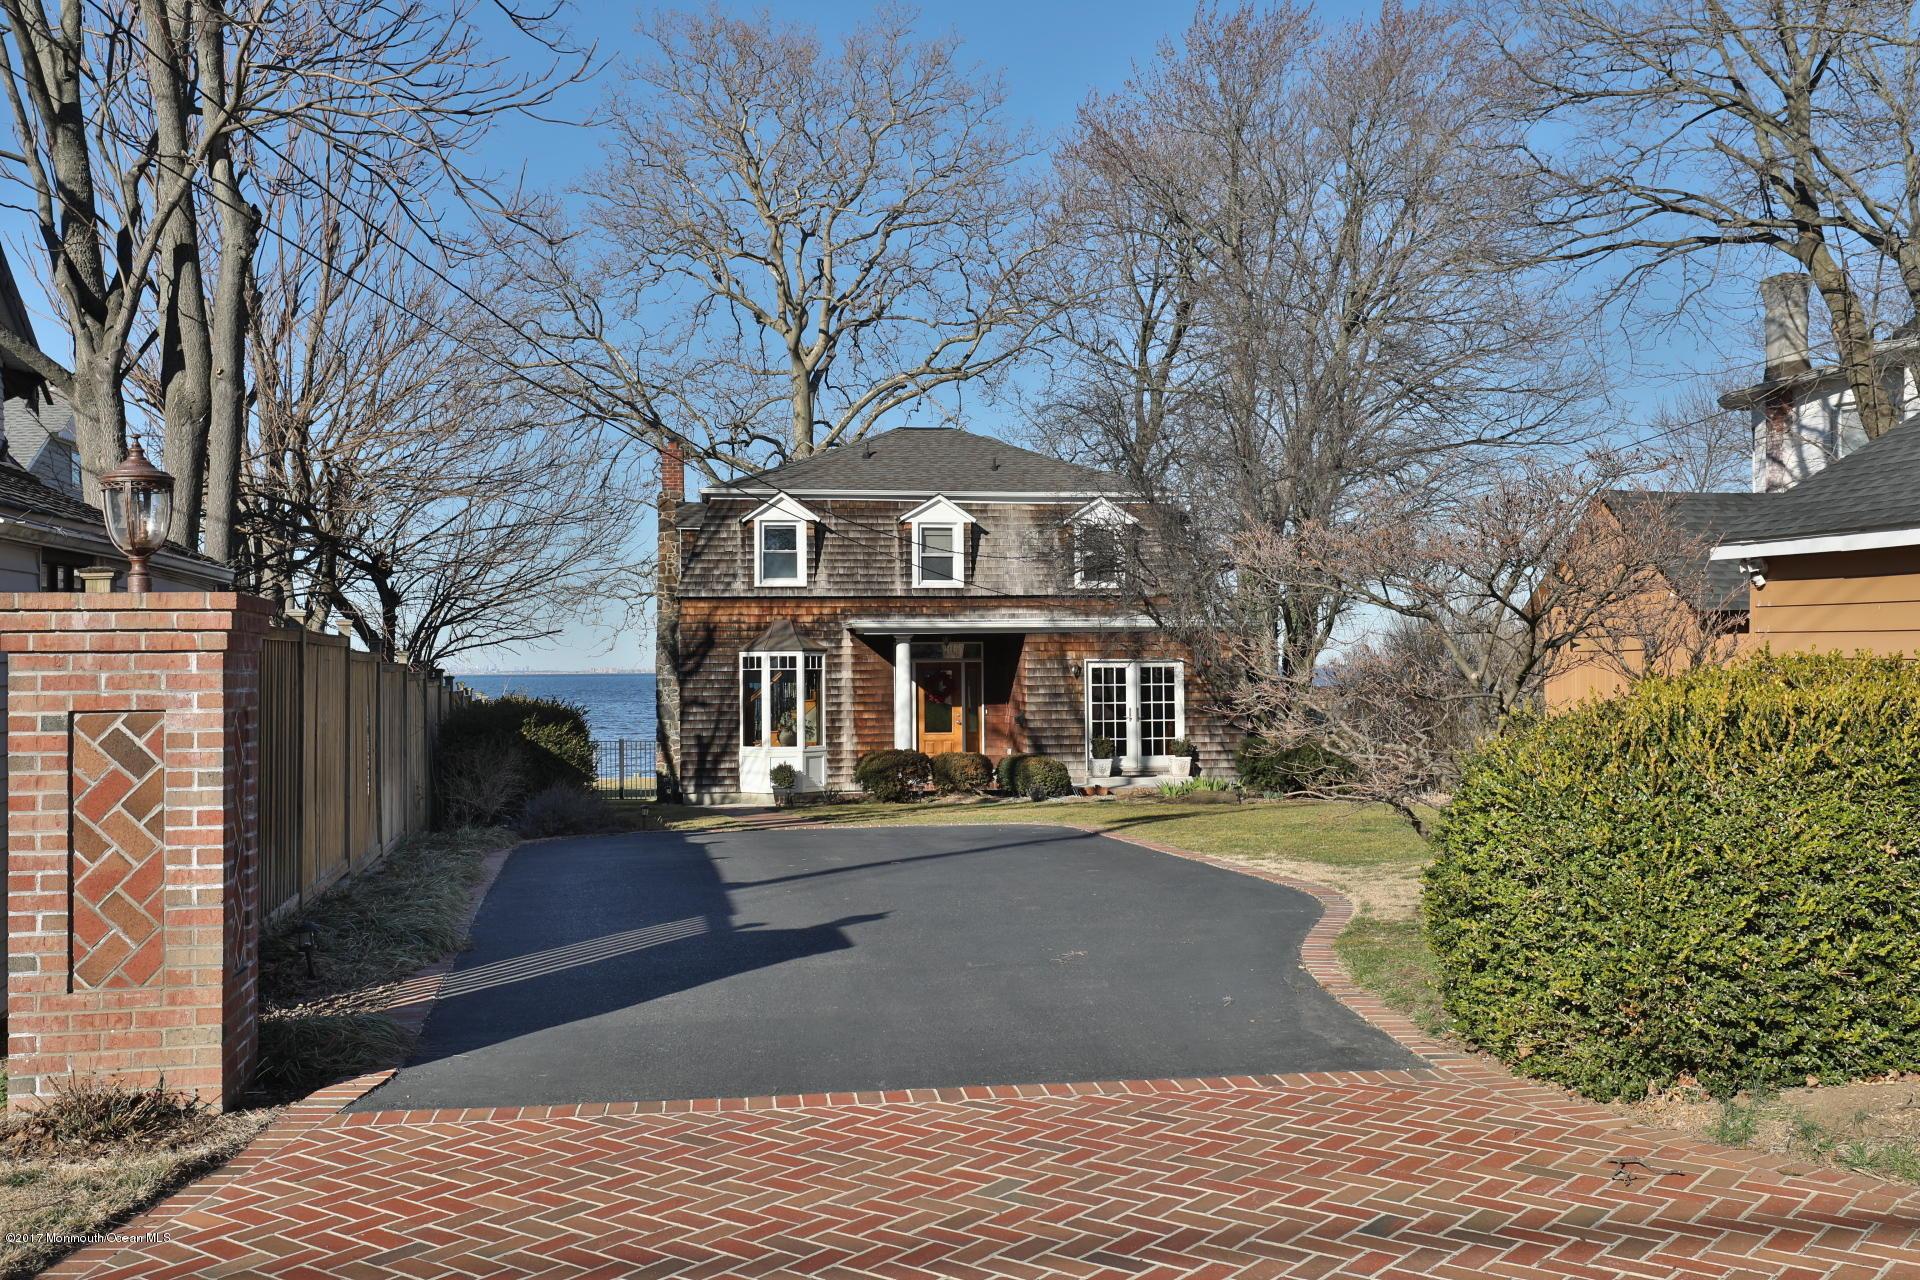 Single Family Home for Sale at 49 Burlington Avenue Leonardo, New Jersey 07737 United States